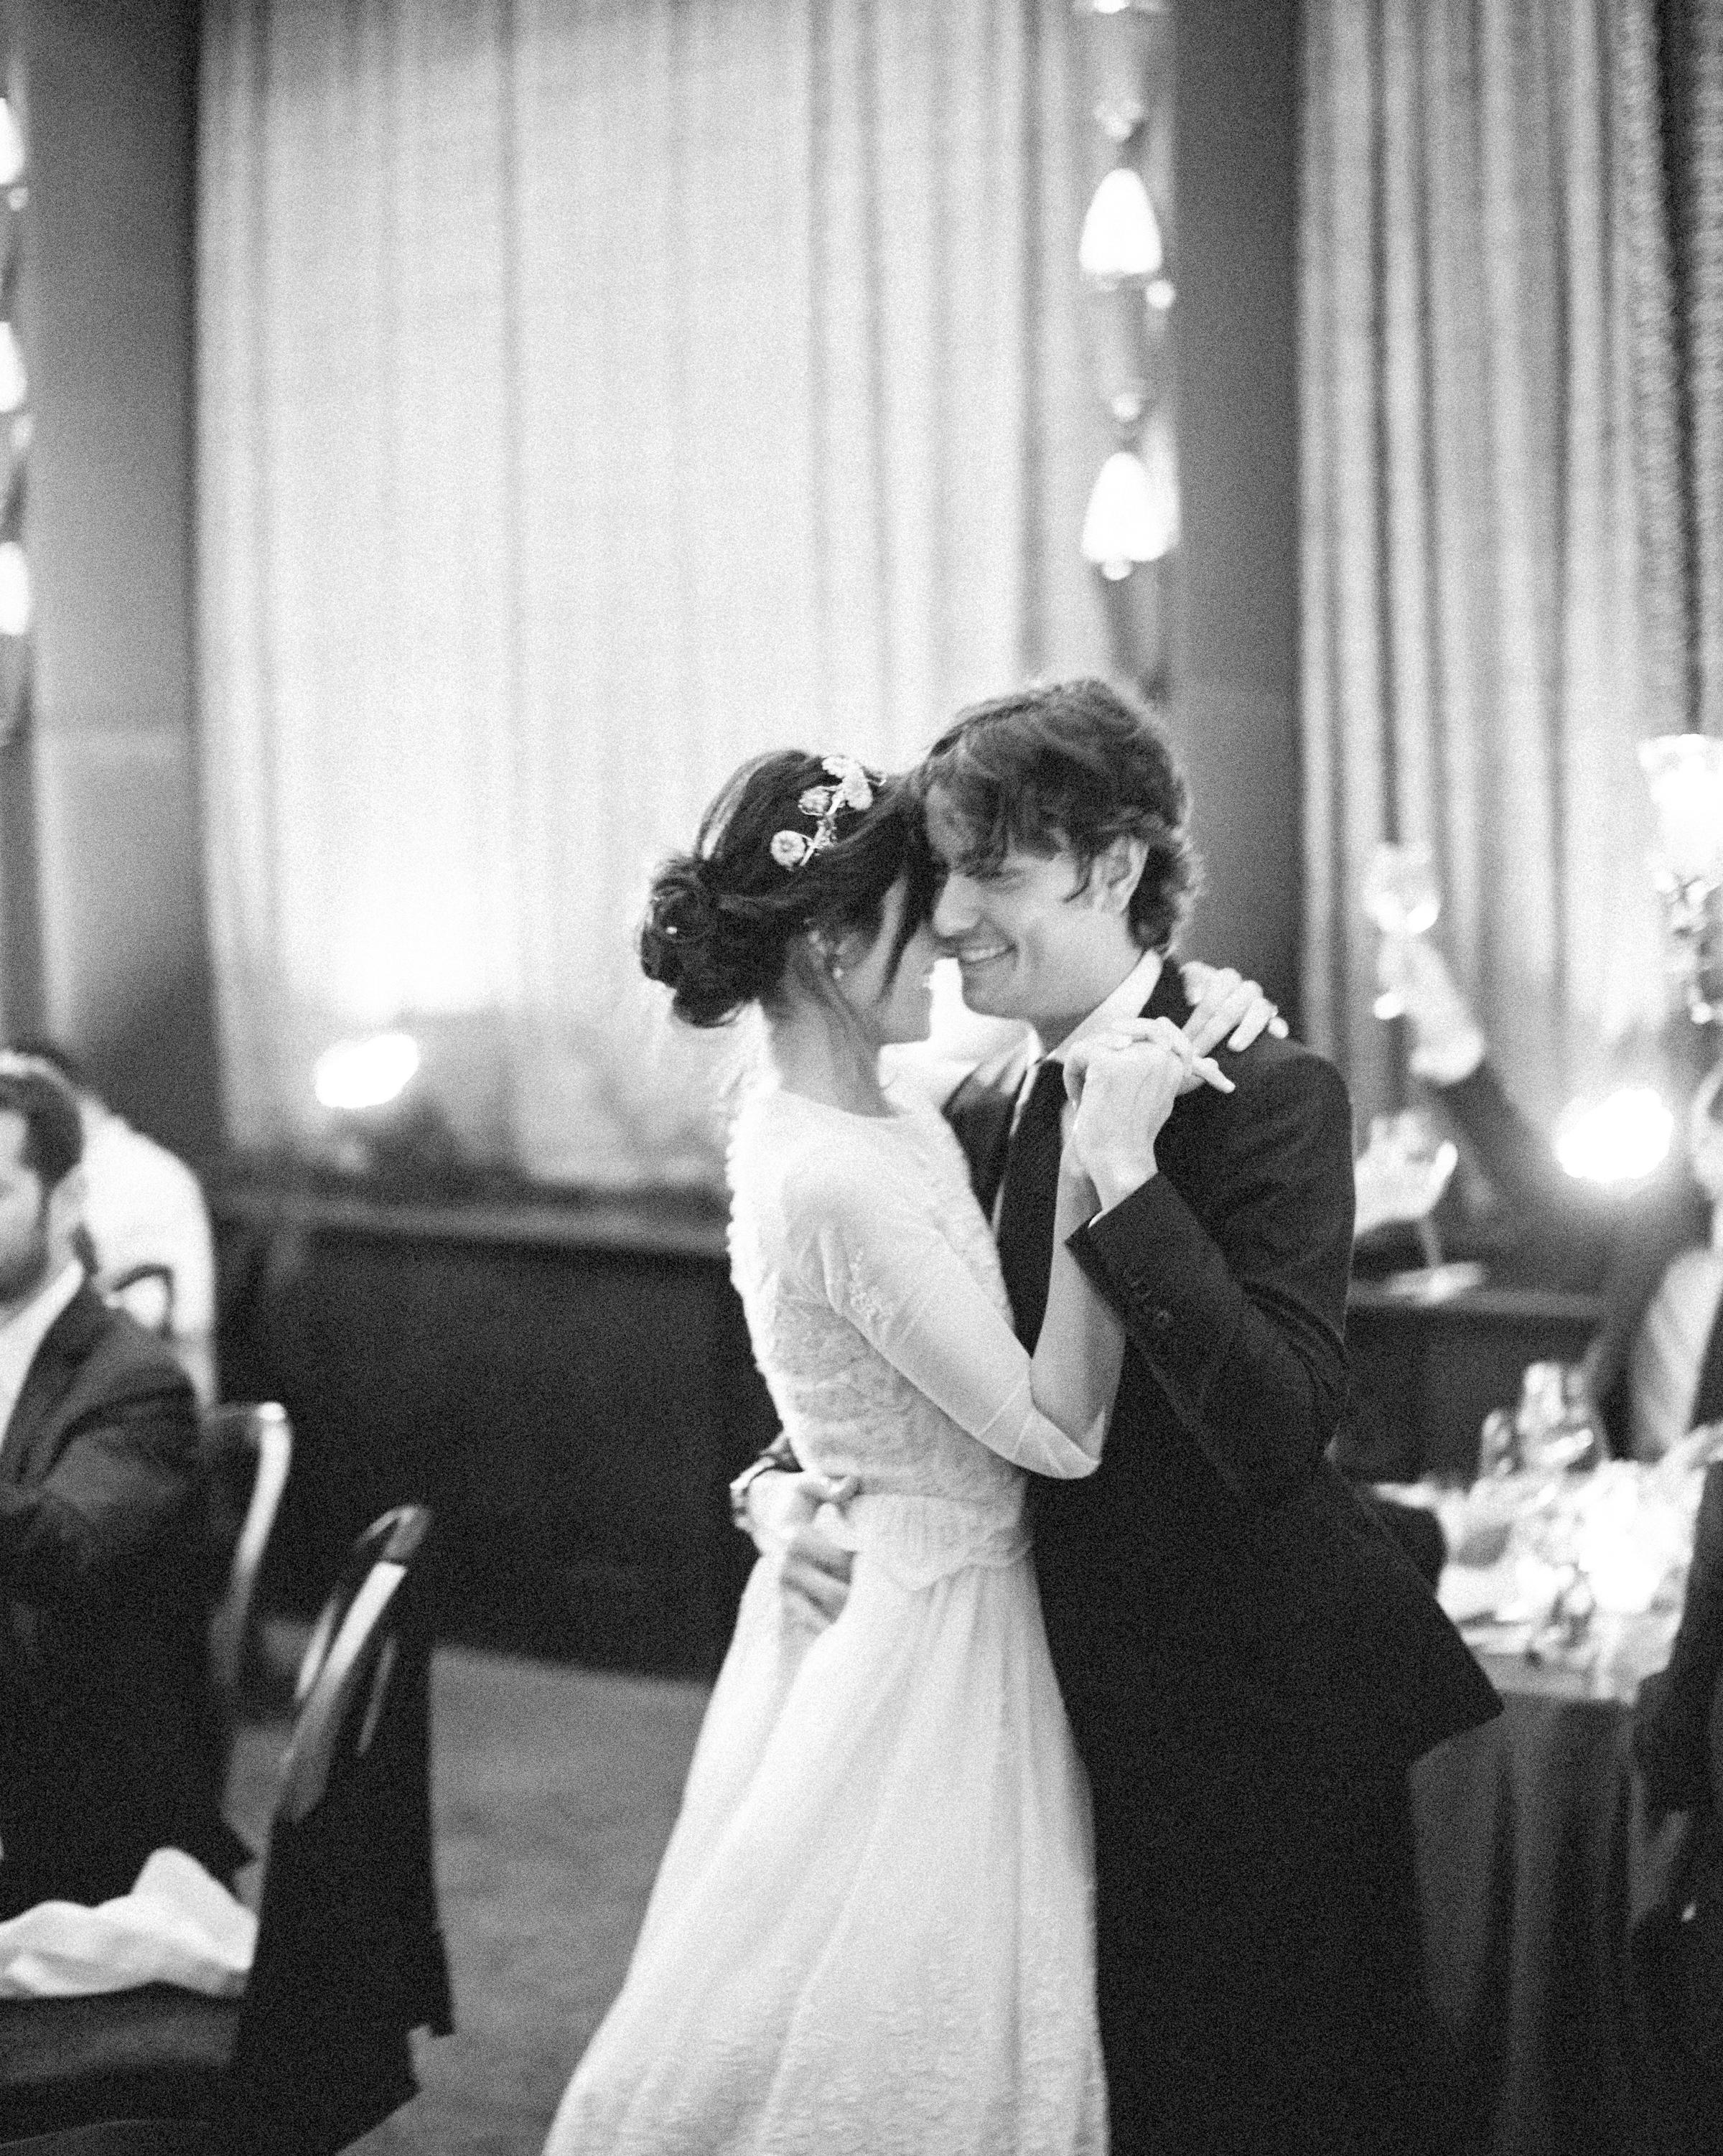 federica-tommaso-wedding-dance-118-s112330-1015.jpg